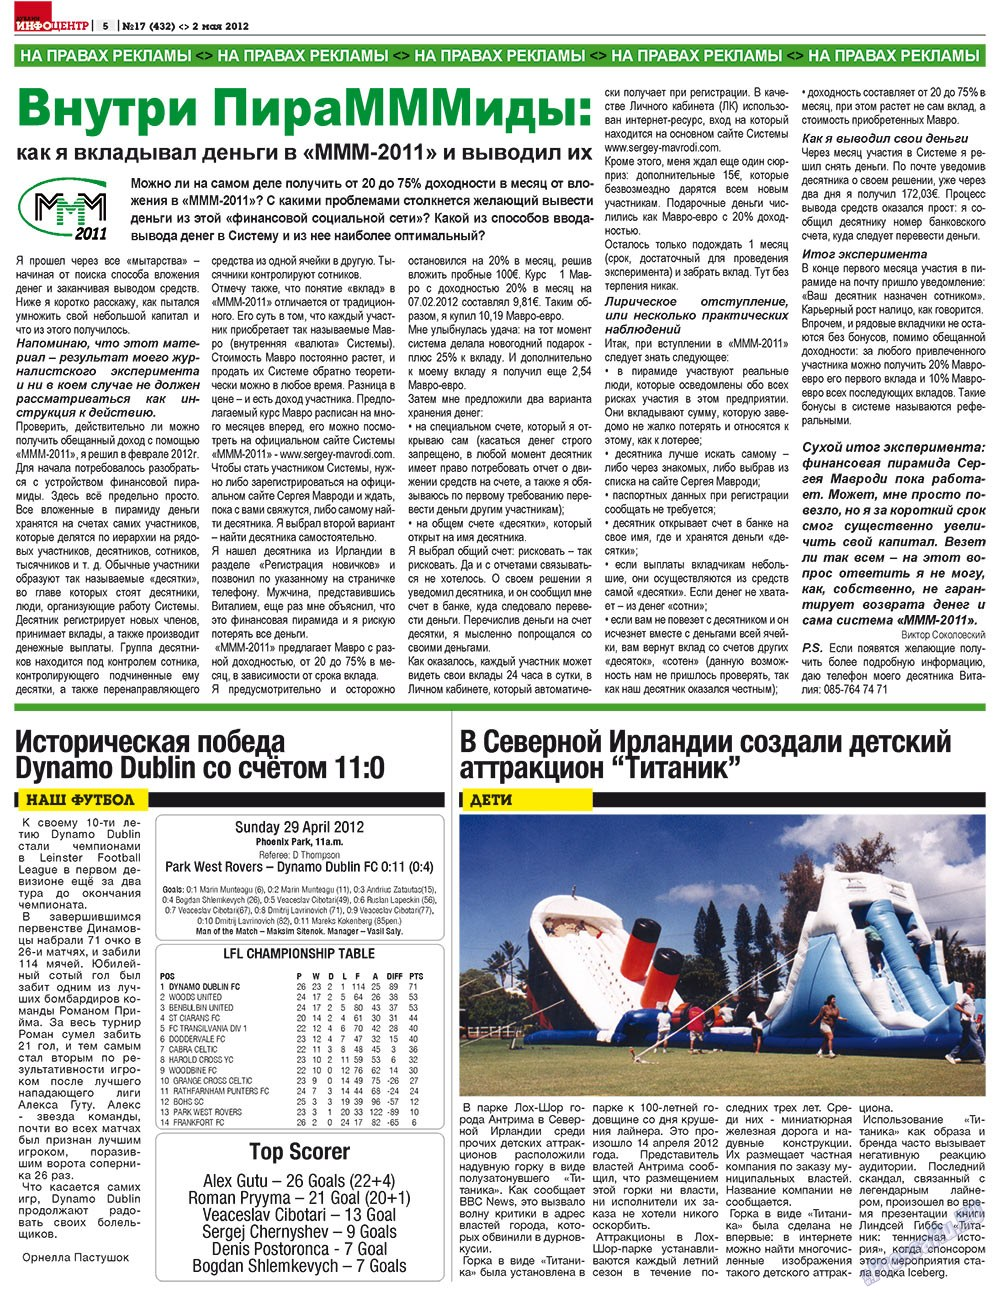 Дублин инфоцентр (газета). 2012 год, номер 17, стр. 5